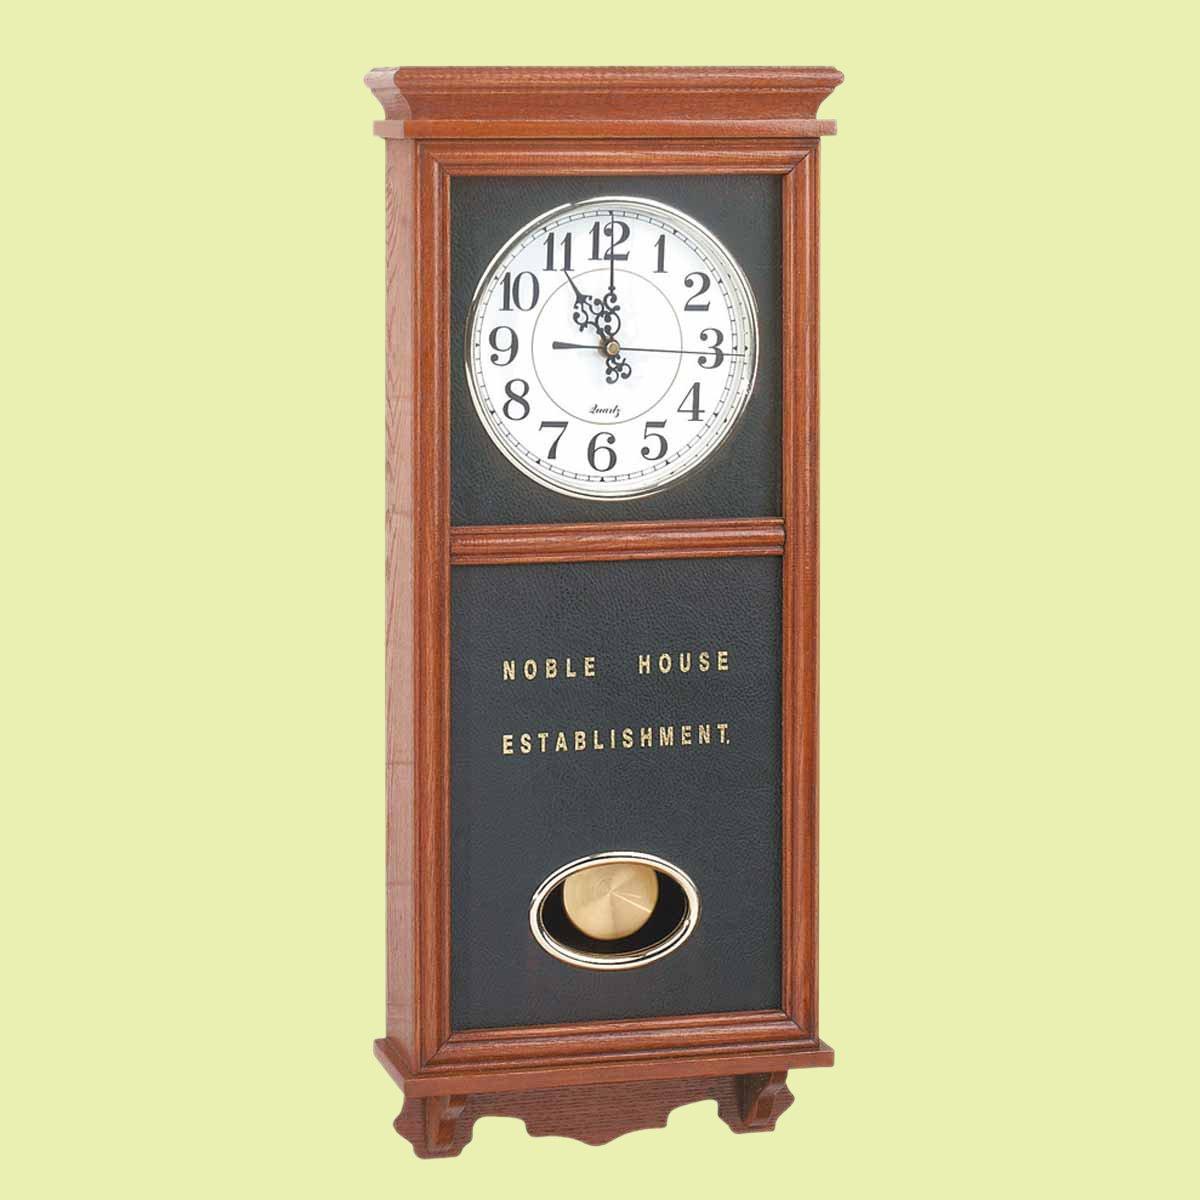 Amazon clocks wood battery operated pendulum clock amazon clocks wood battery operated pendulum clock renovators supply home kitchen amipublicfo Gallery